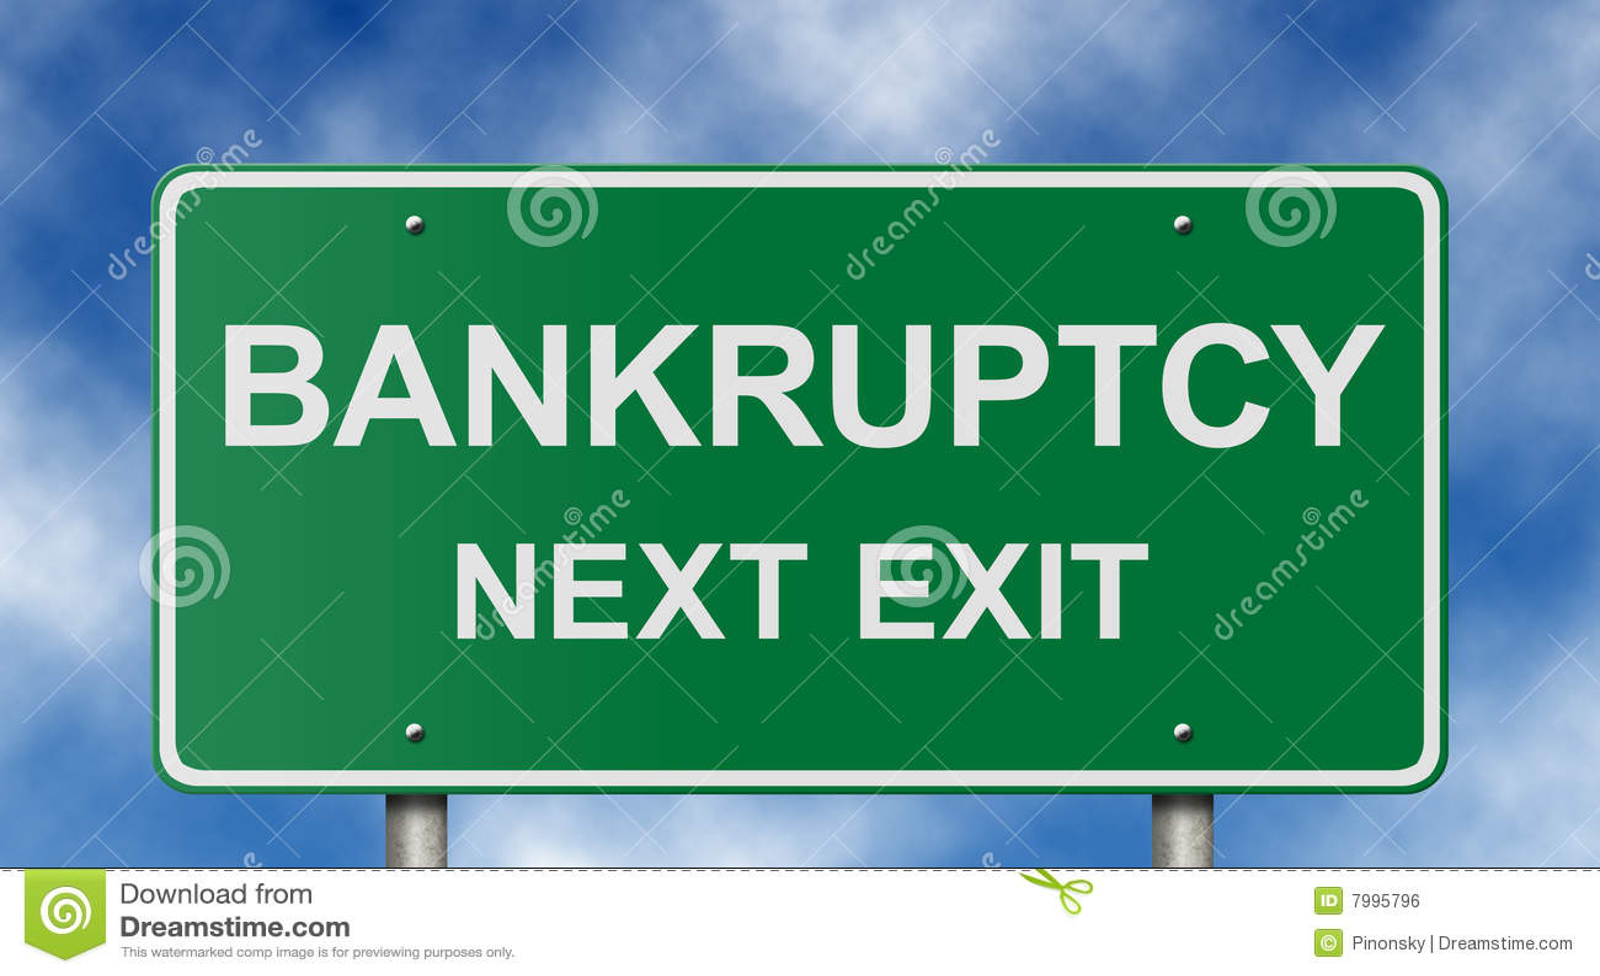 Bankruptcy Next Exit Sign